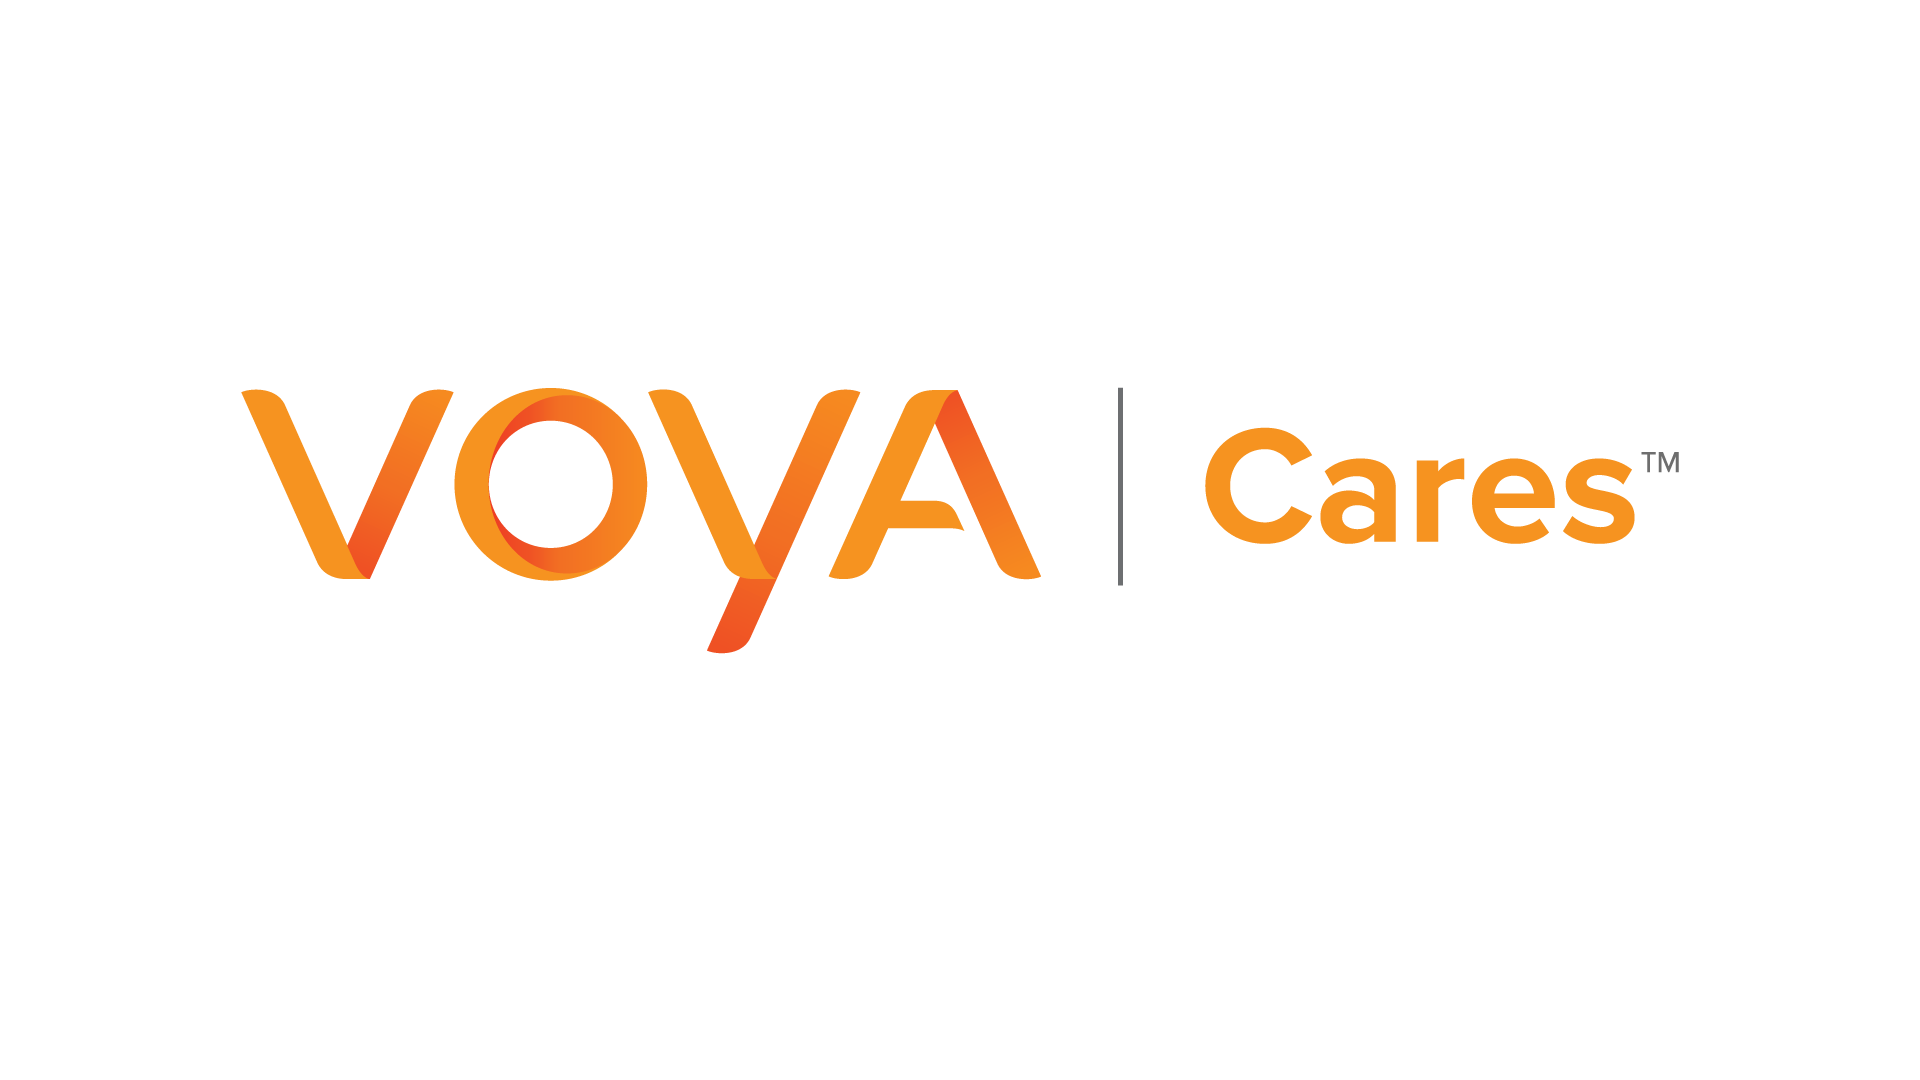 voya financial nyse voya and national down syndrome society ring